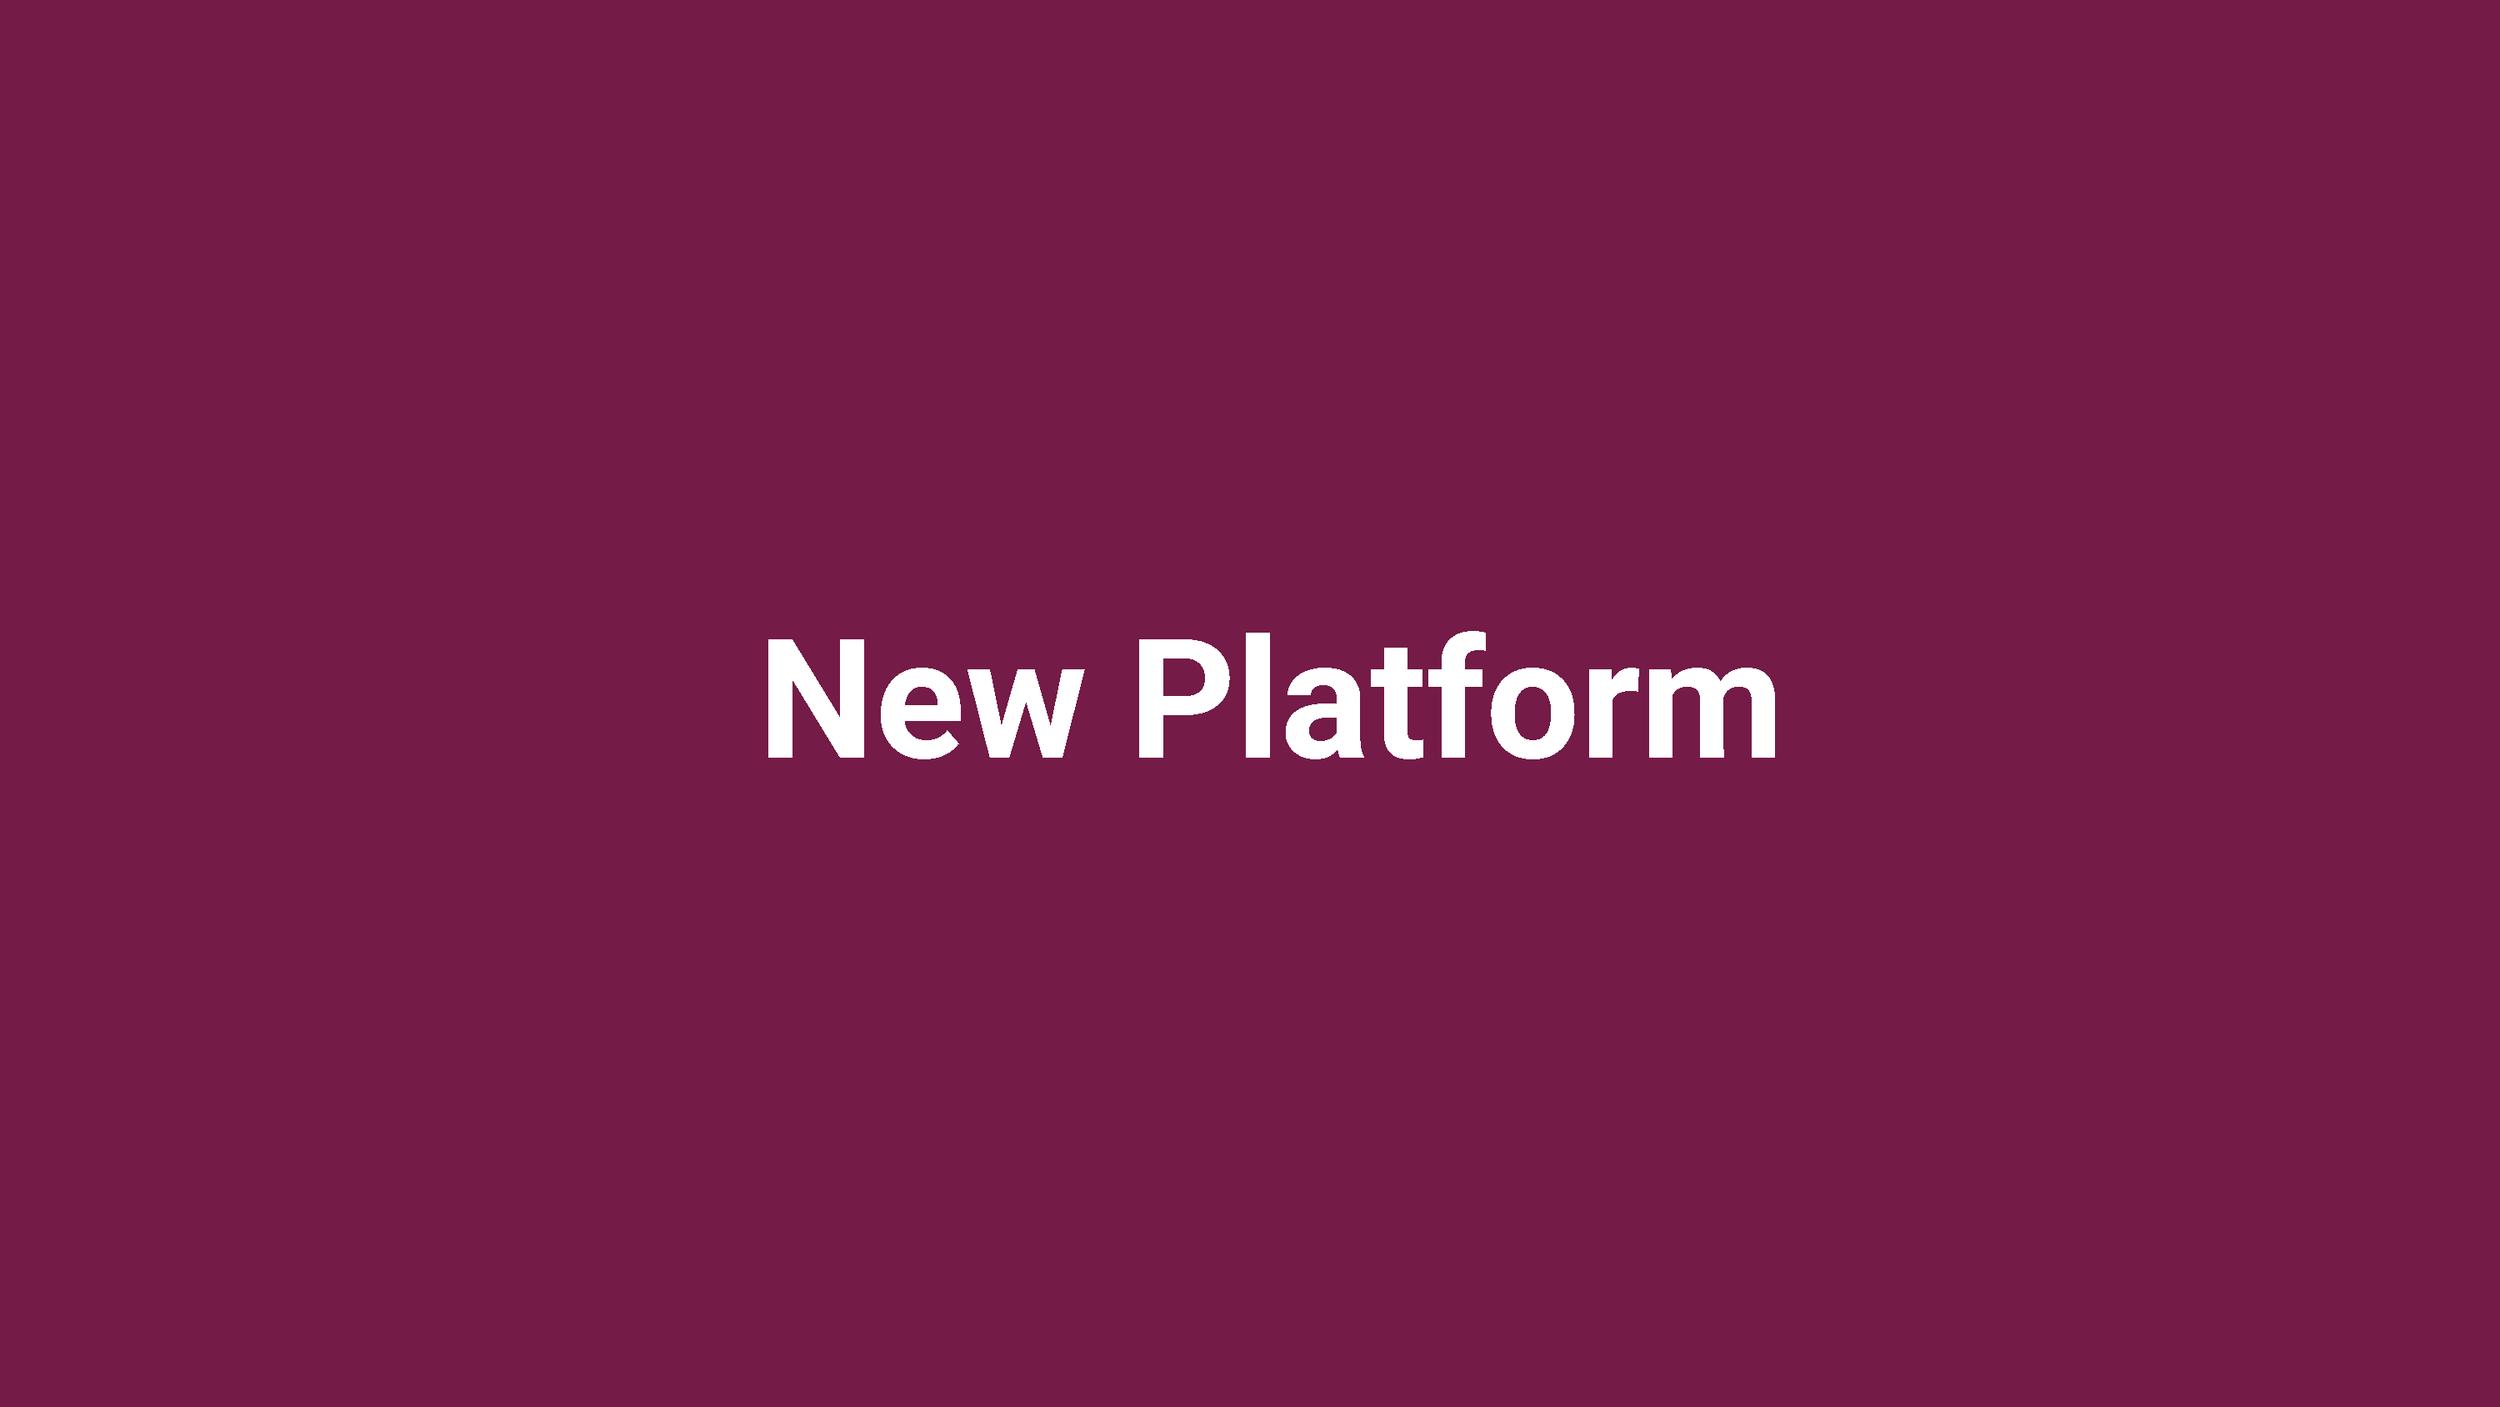 New Platform_Page_01.png